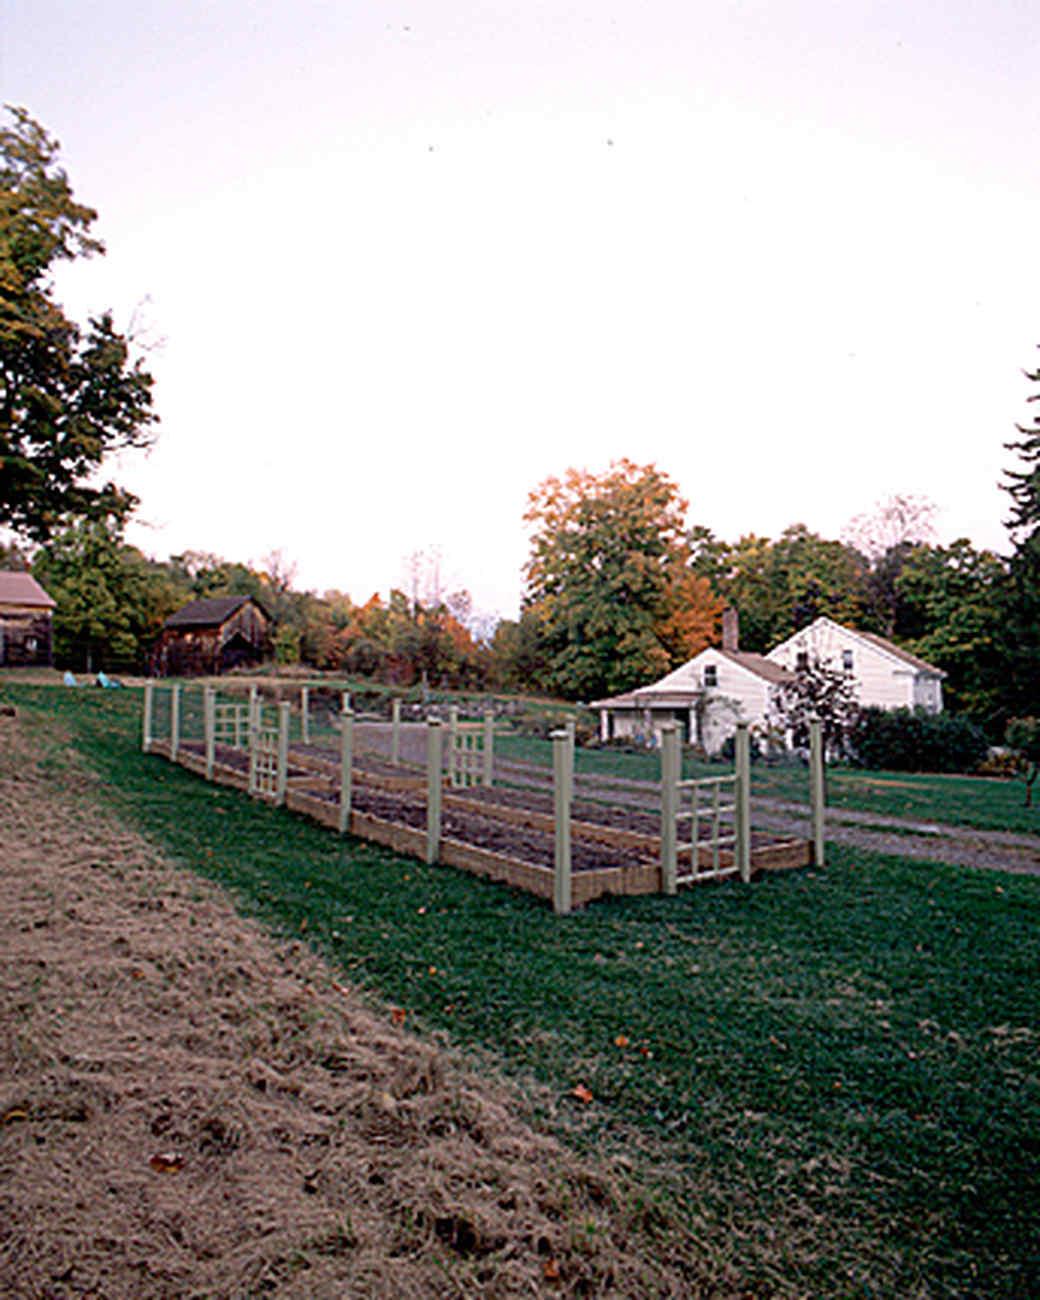 raised-beds-2-a97052-1215.jpg